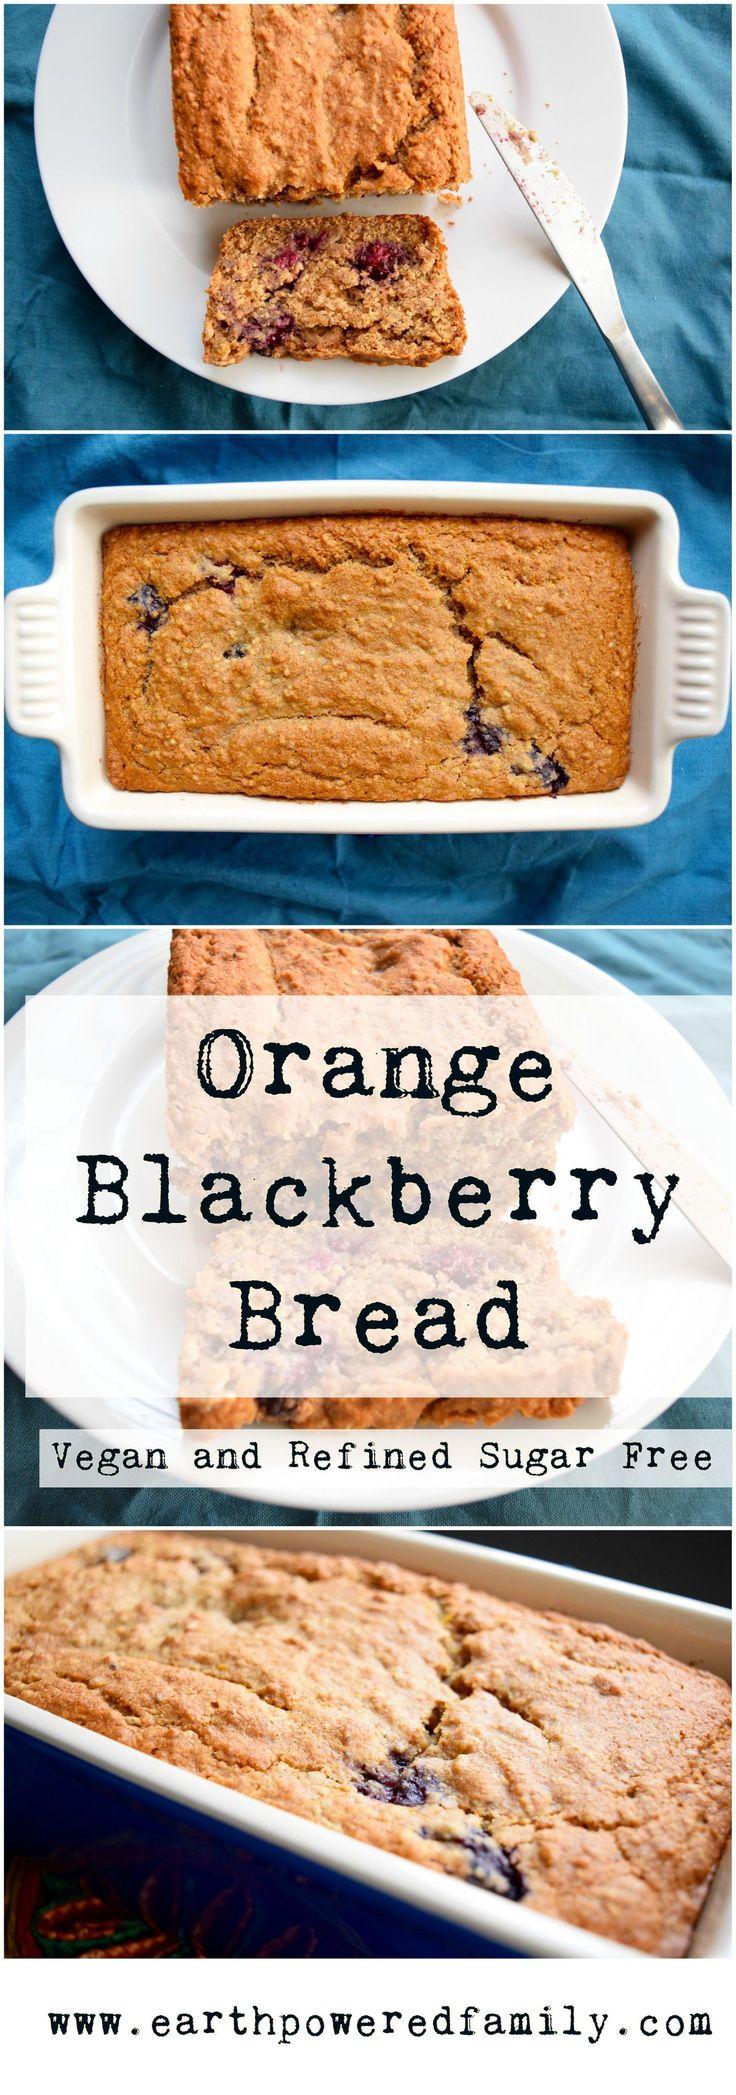 Orange and blackberry bread: vegan, dairy free, and refined sugar free.